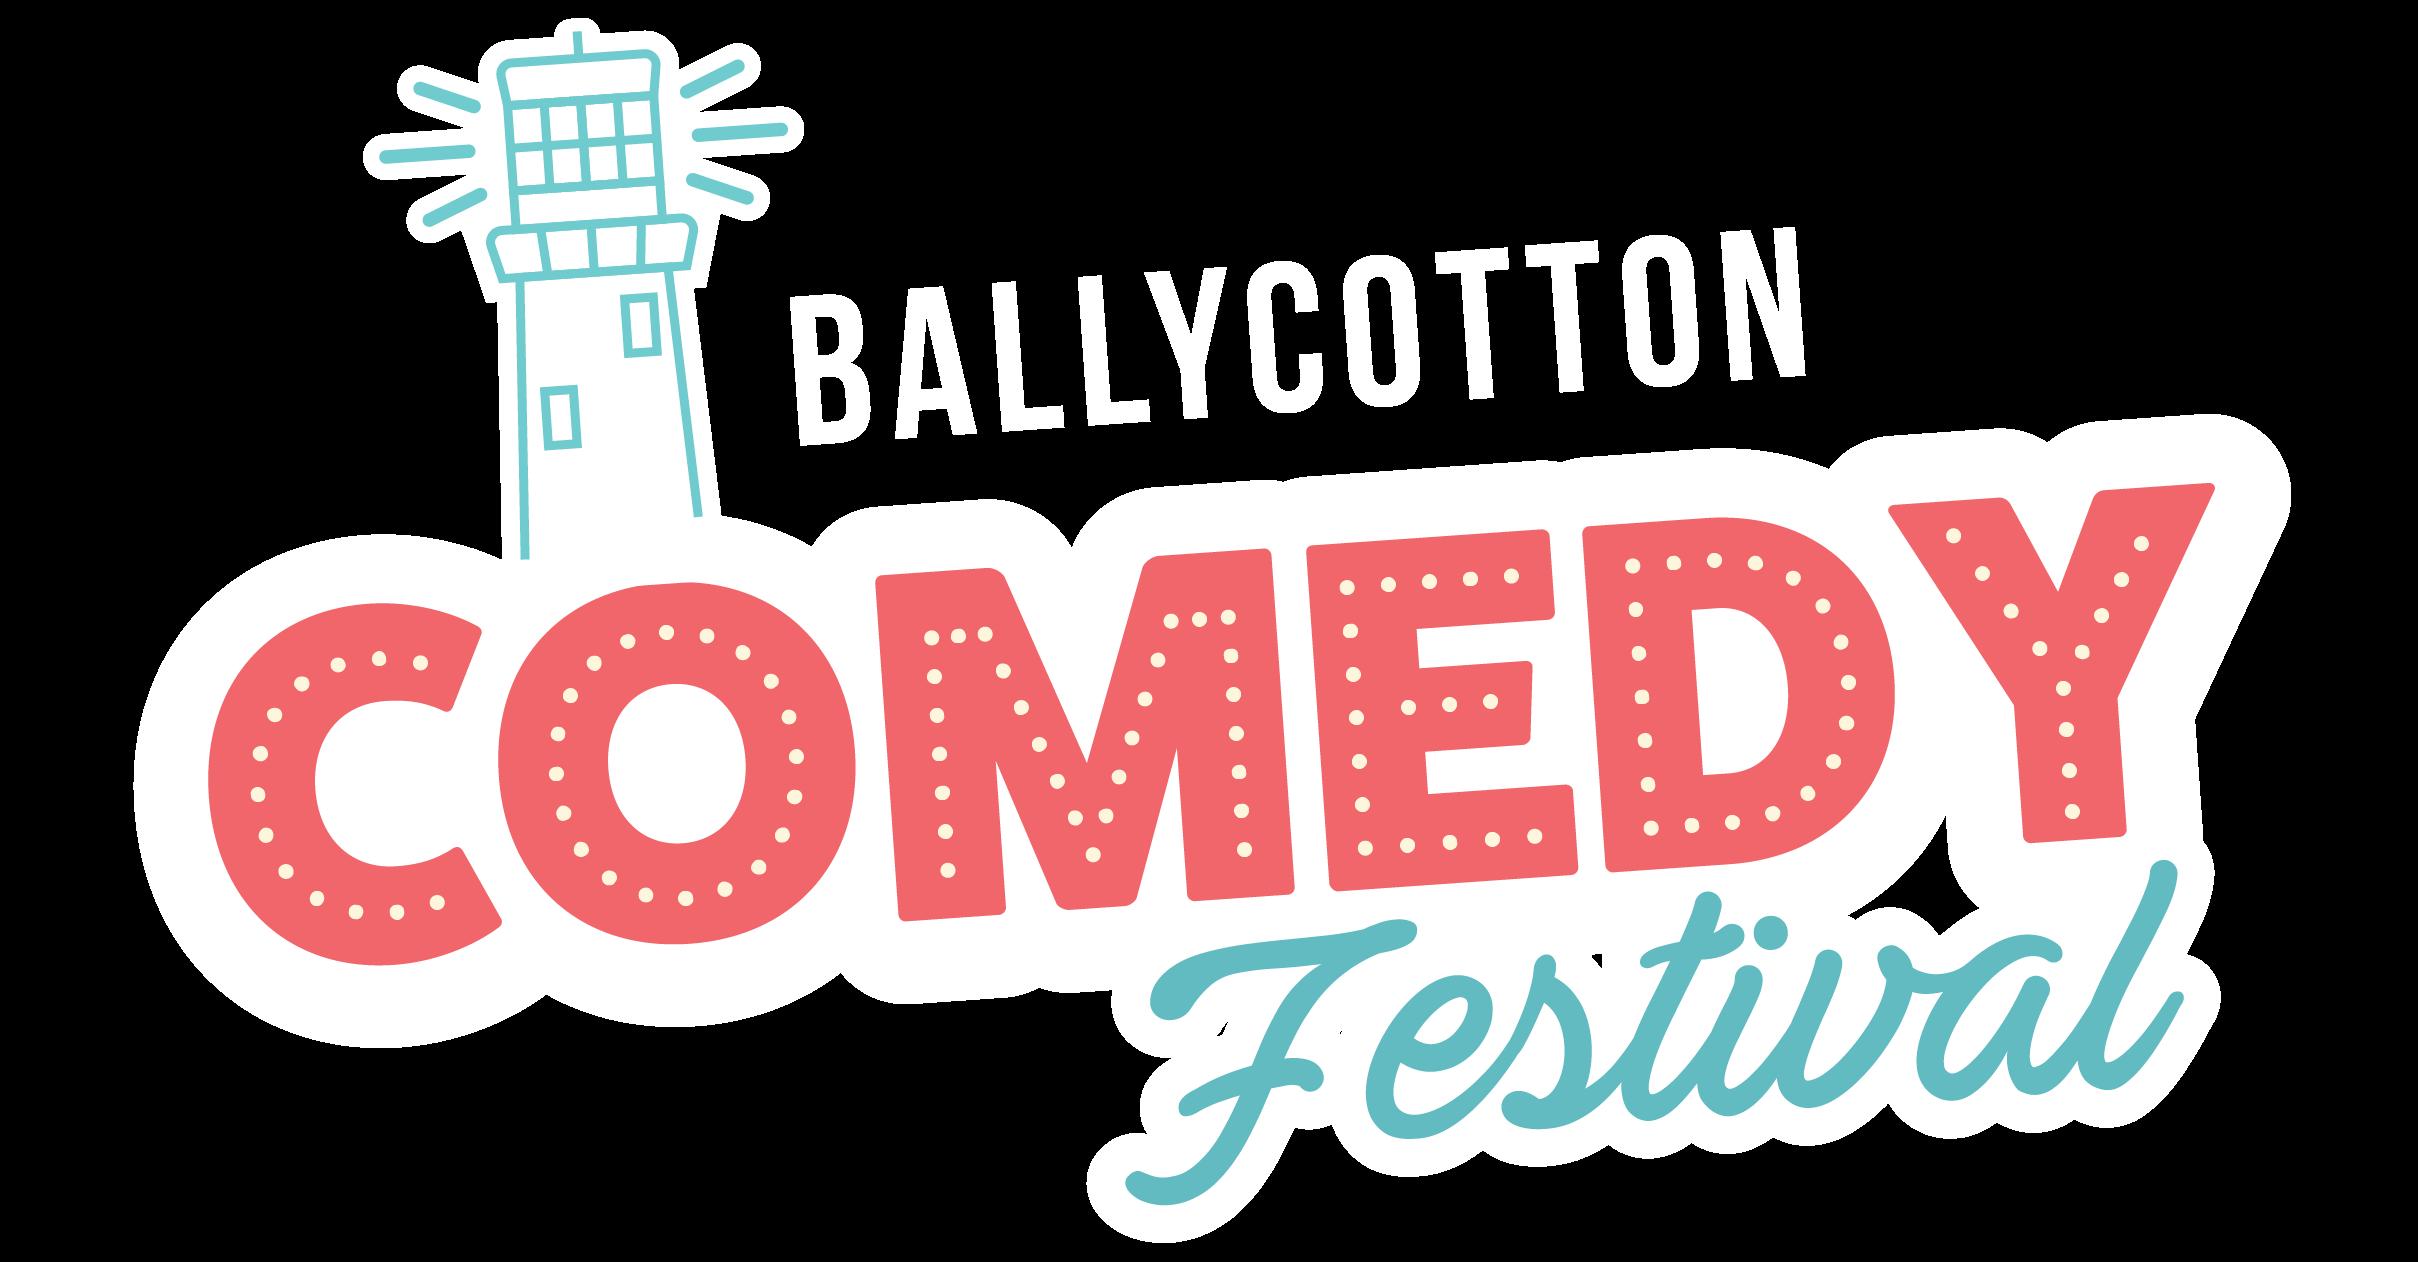 Ballycotton Events